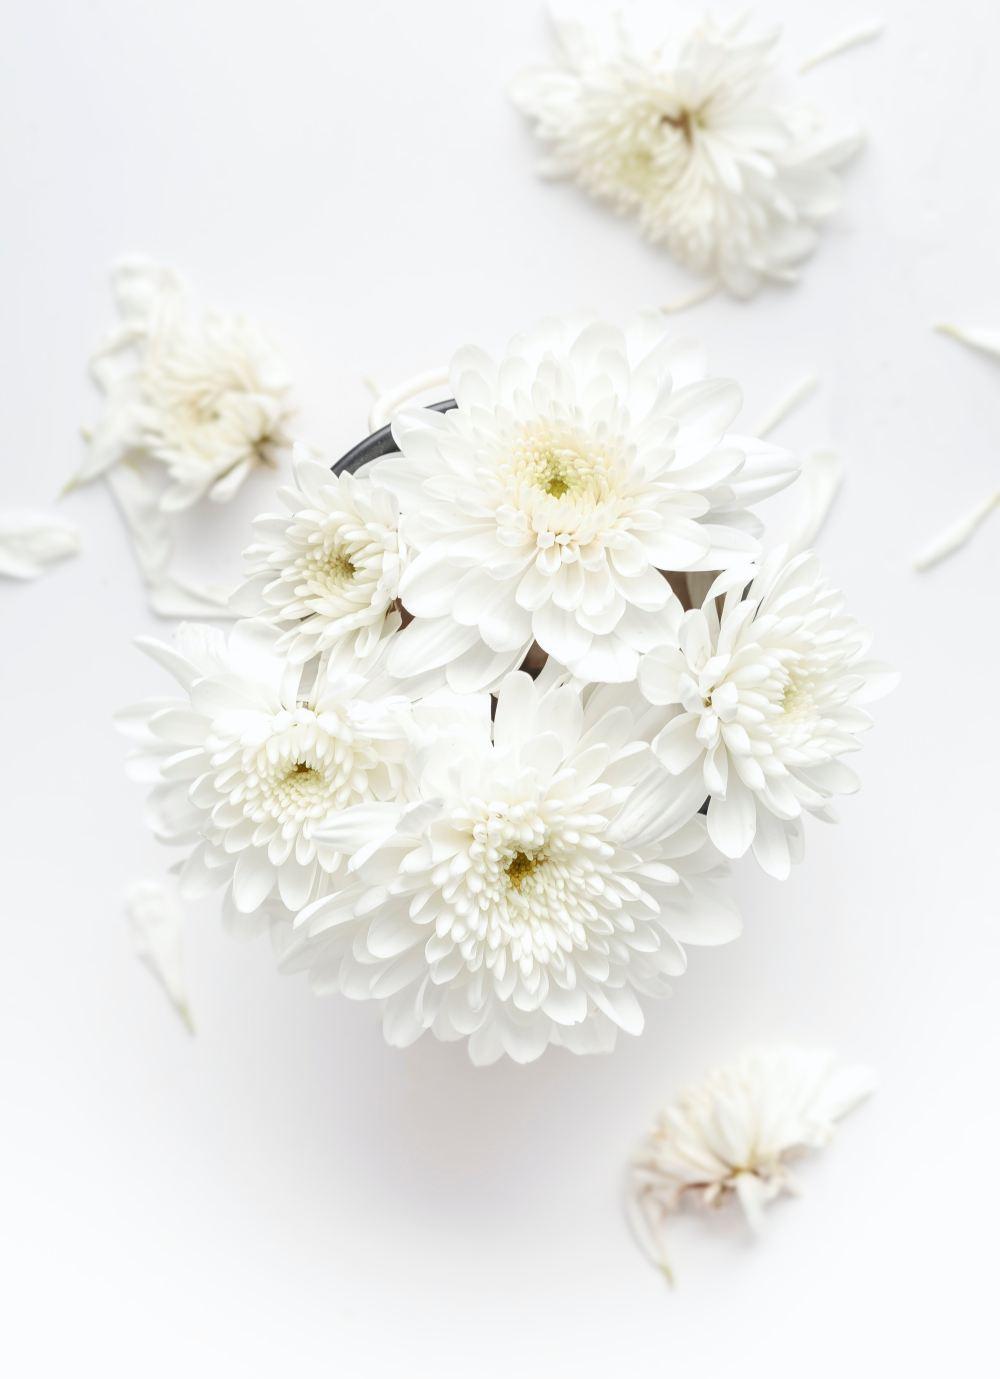 Floral Wallpapers Free Hd Download 500 Hq Unsplash